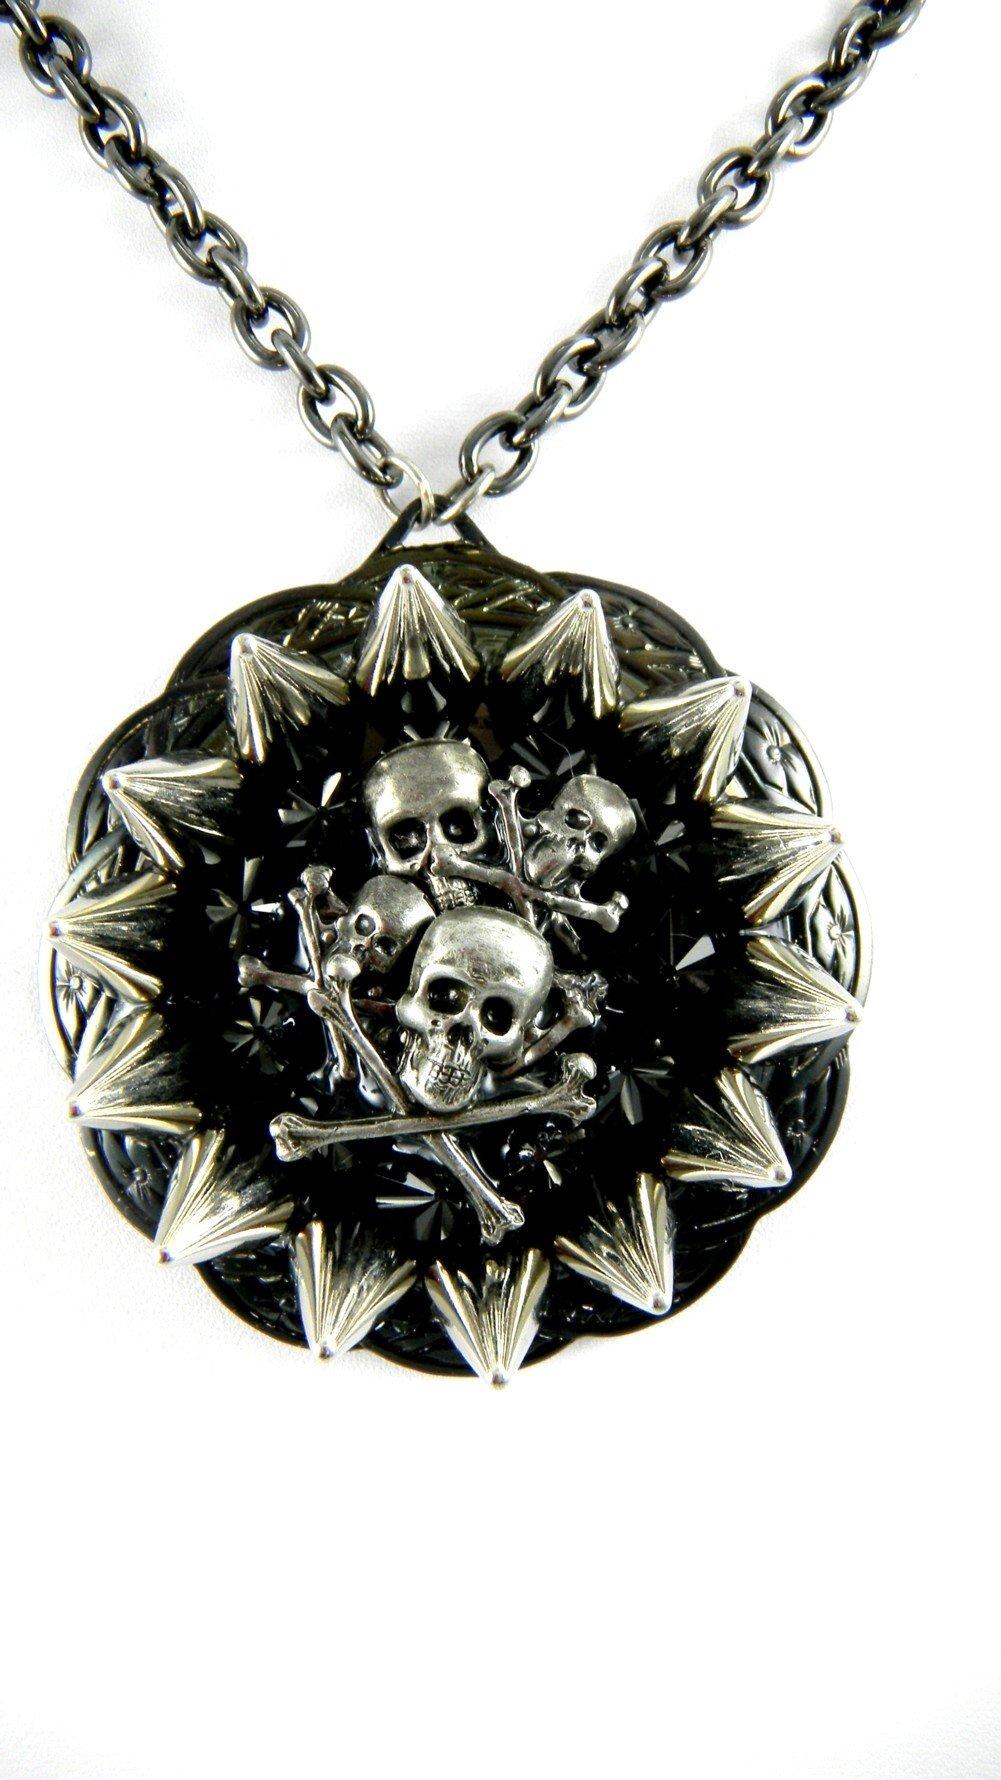 Rocker Jewelry Skull Pile Metal Spikes Medallion Black Crystal Chain Length: 18 Inch